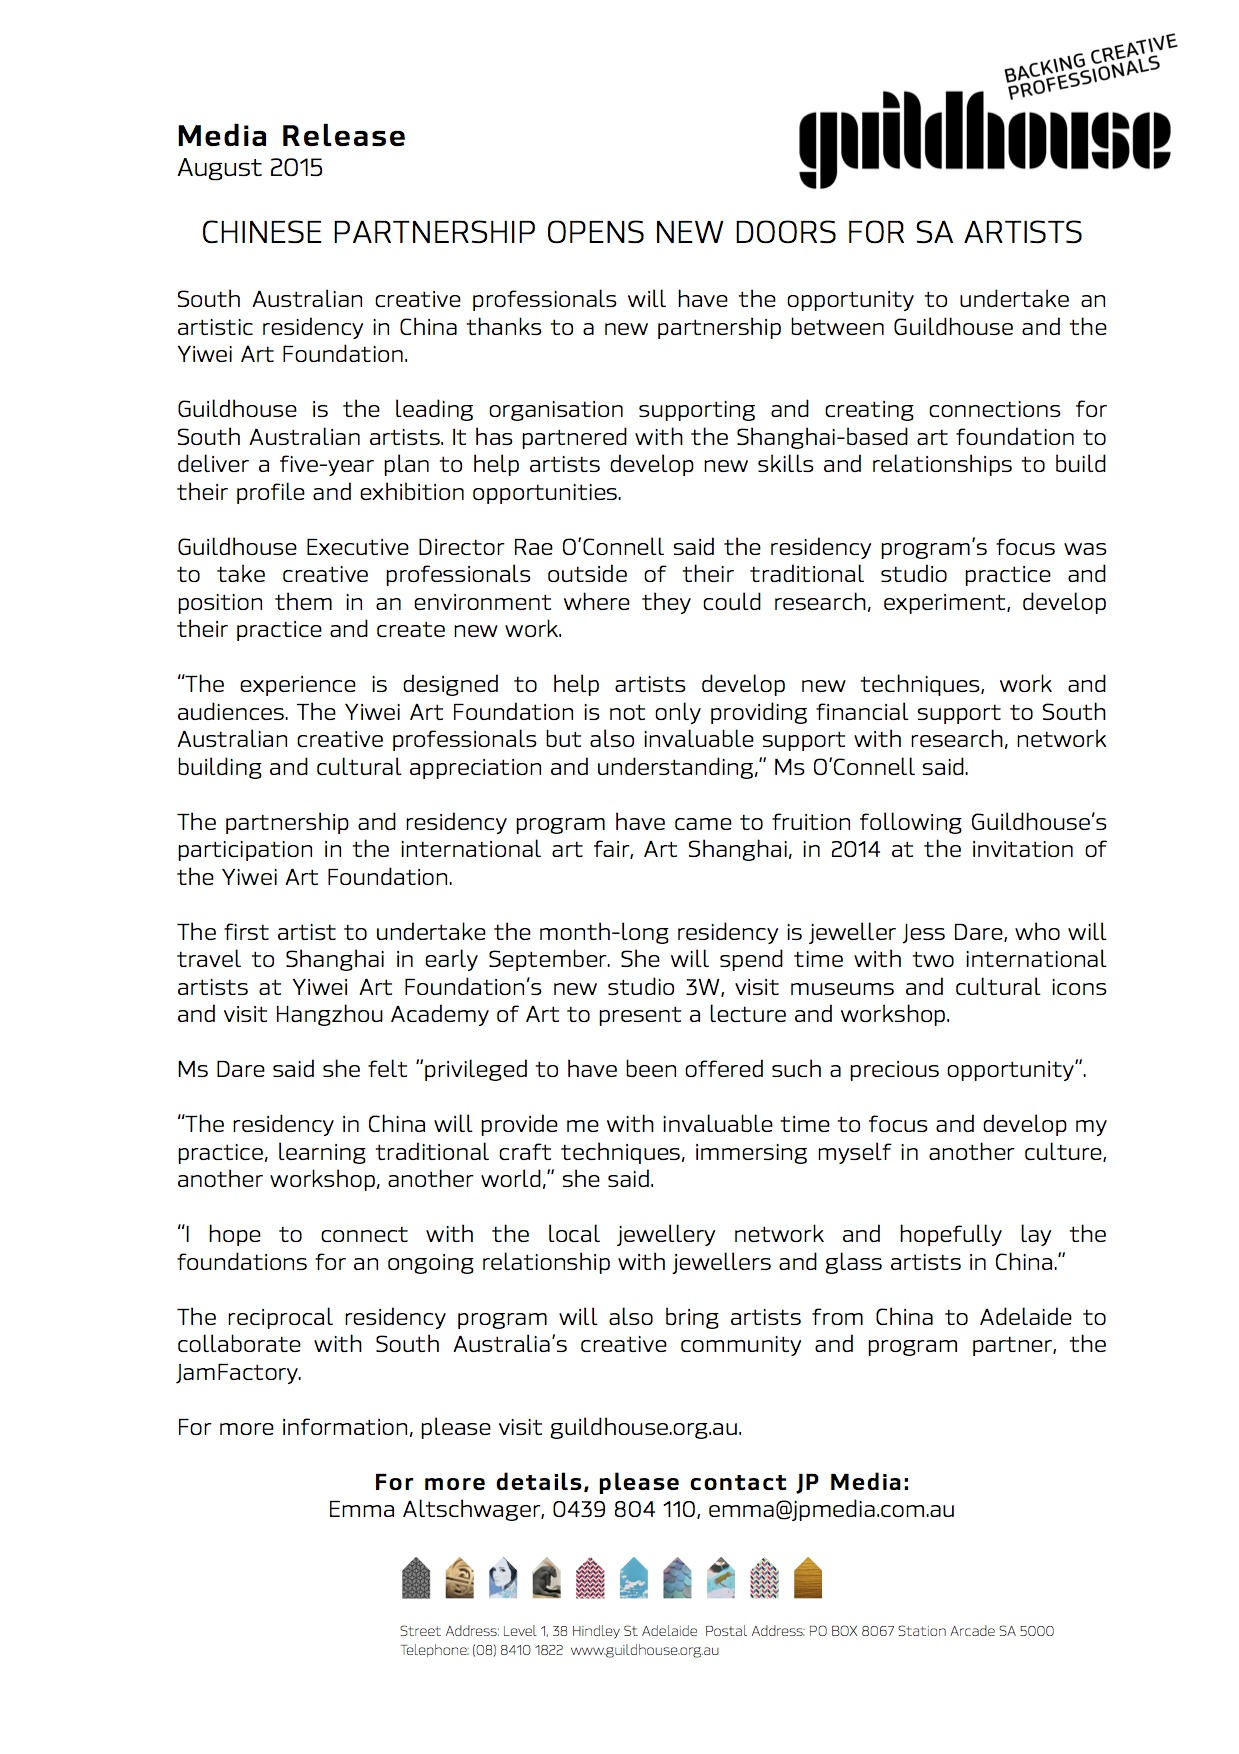 Guildhouse China Residency Media Release FINAL copy-2.jpg